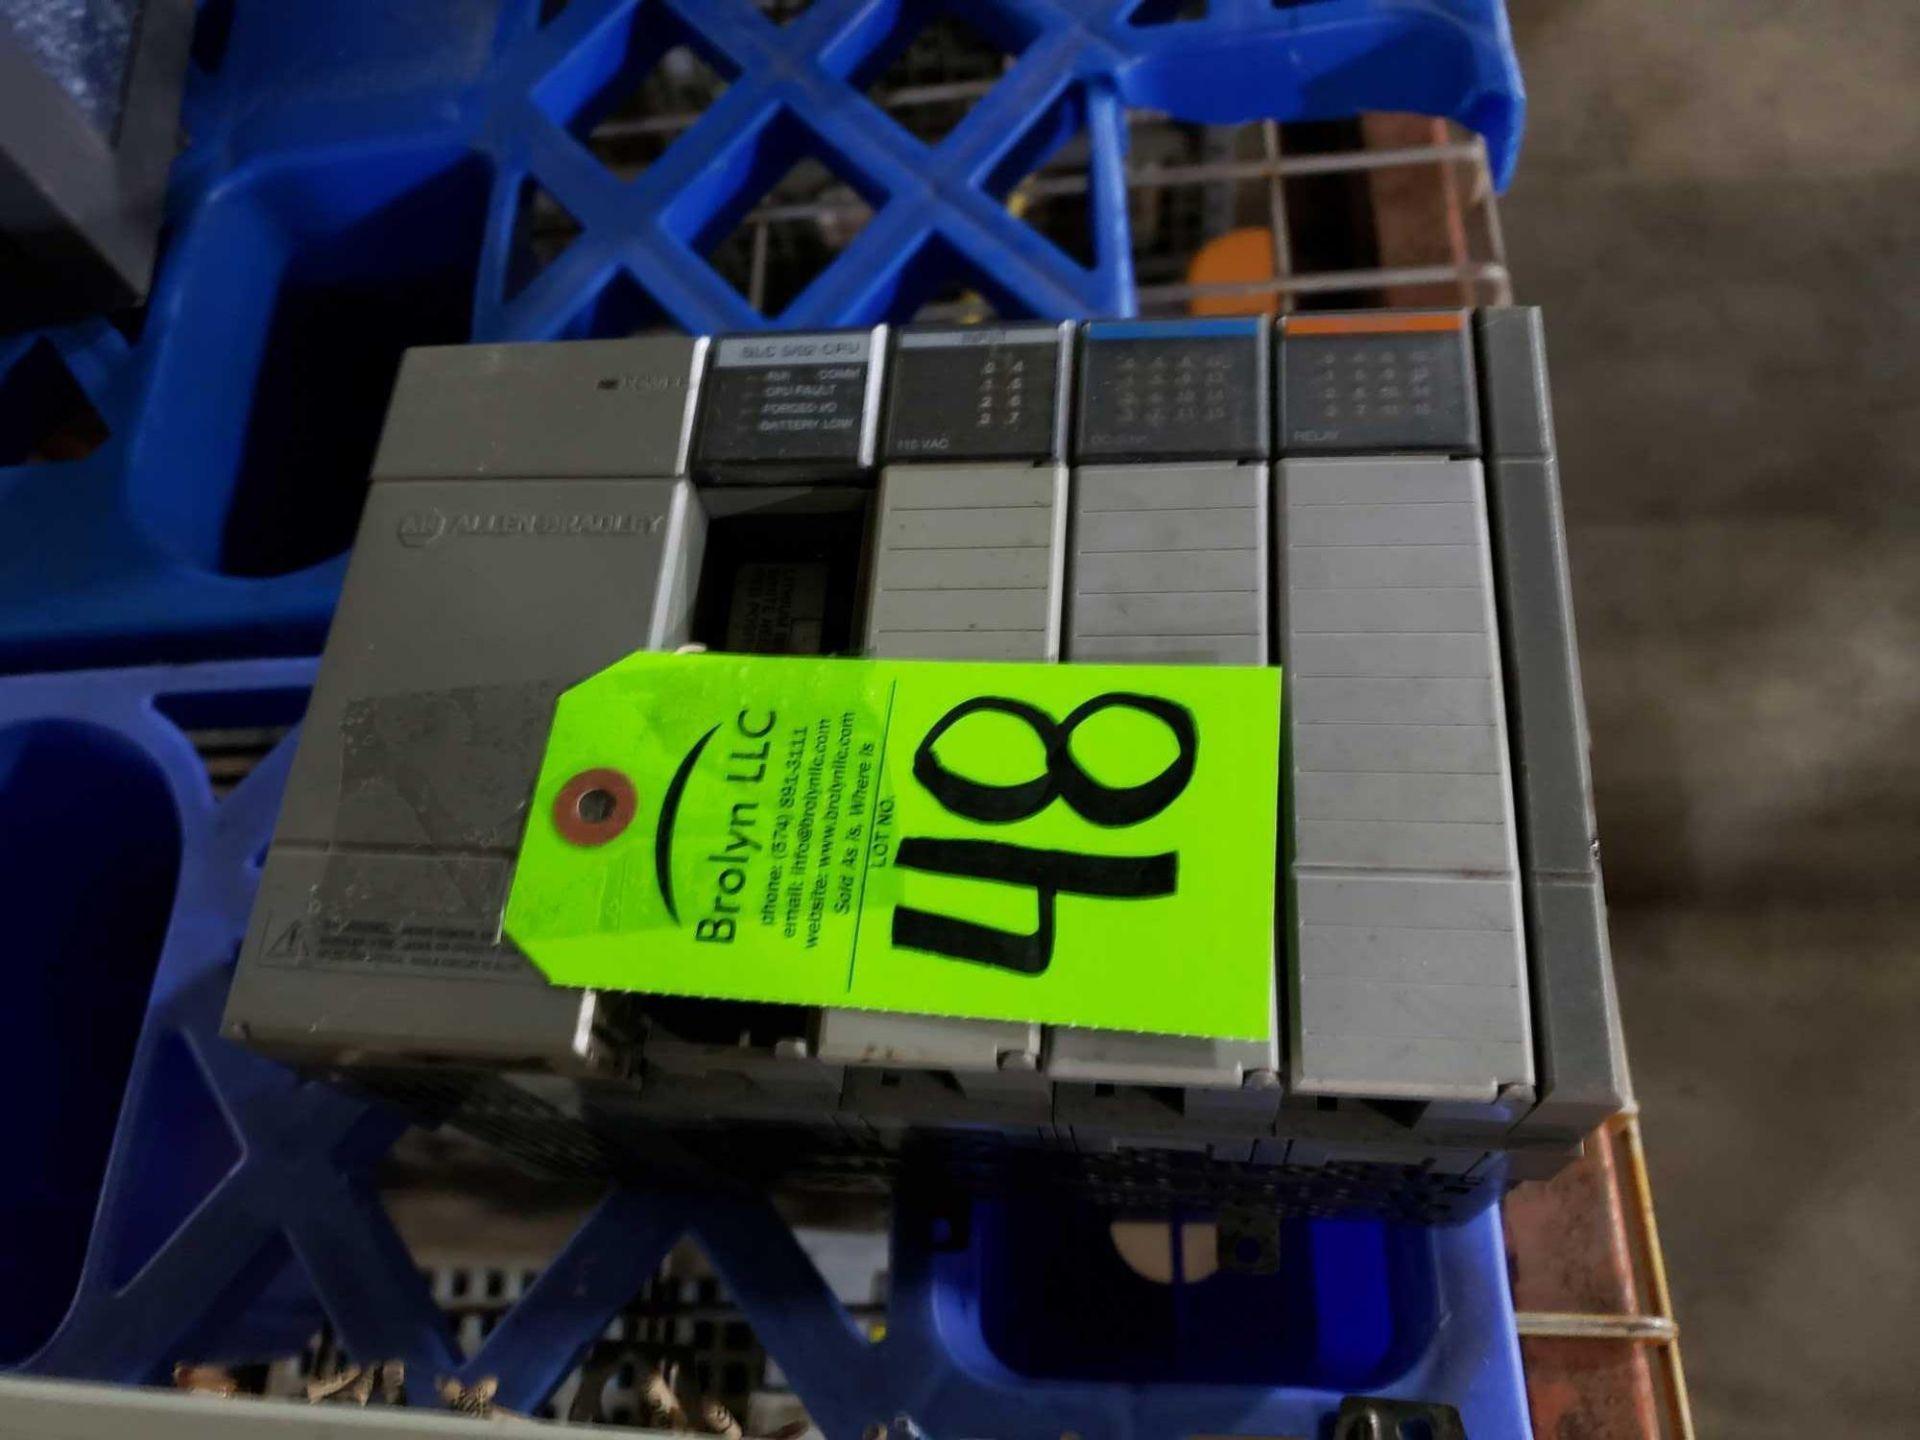 Lot 48 - Allen Bradley SLC500 rack as pictured.